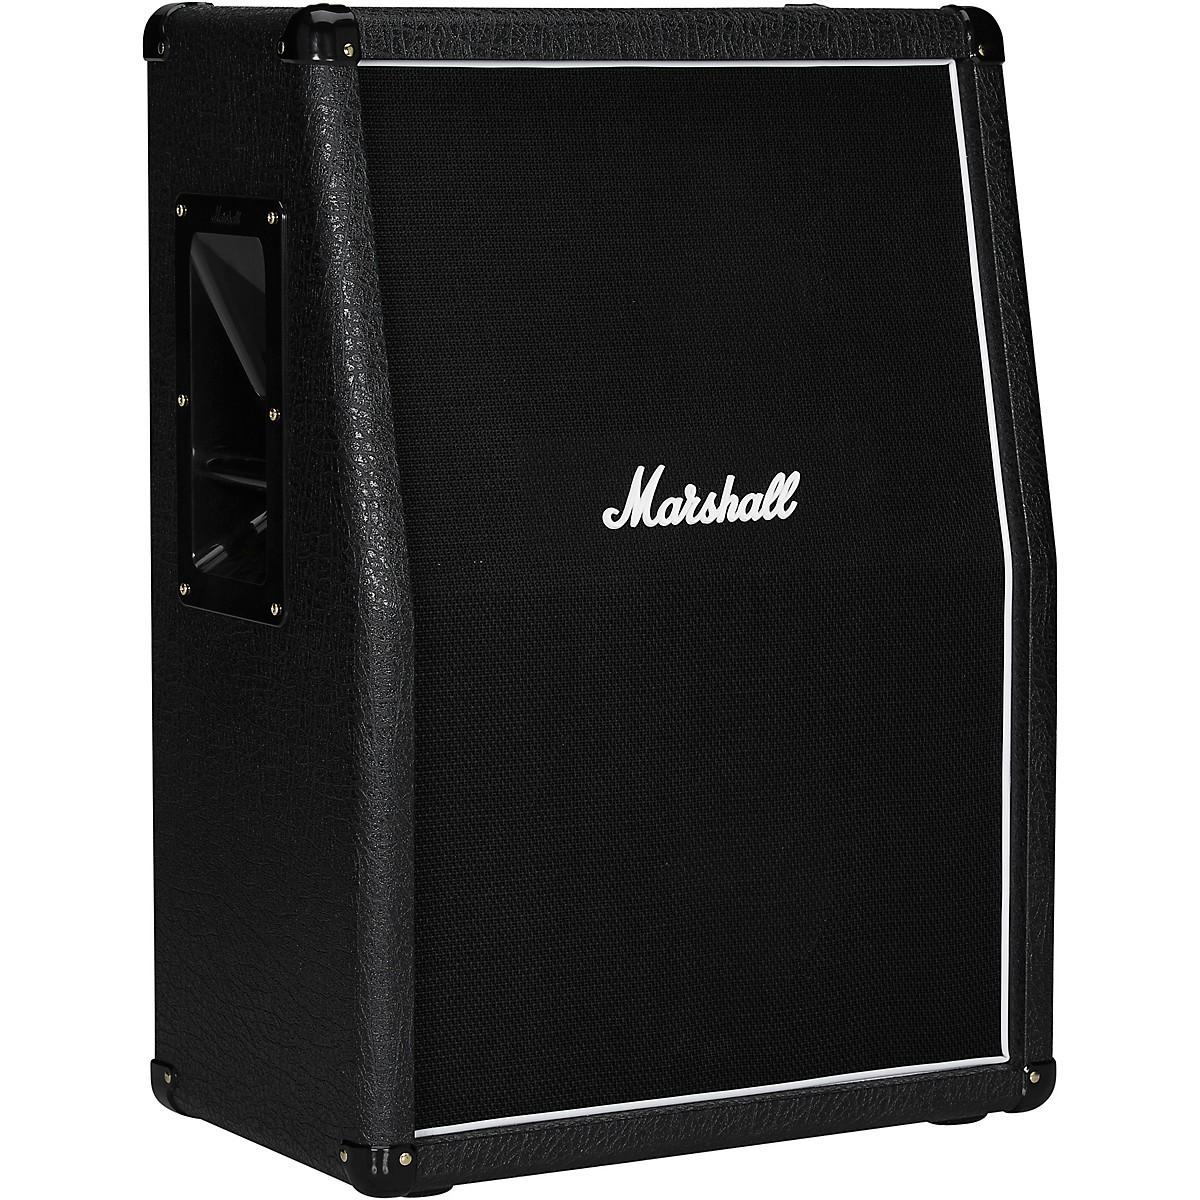 Marshall Studio Classic 140W 2x12 Guitar Speaker Cabinet